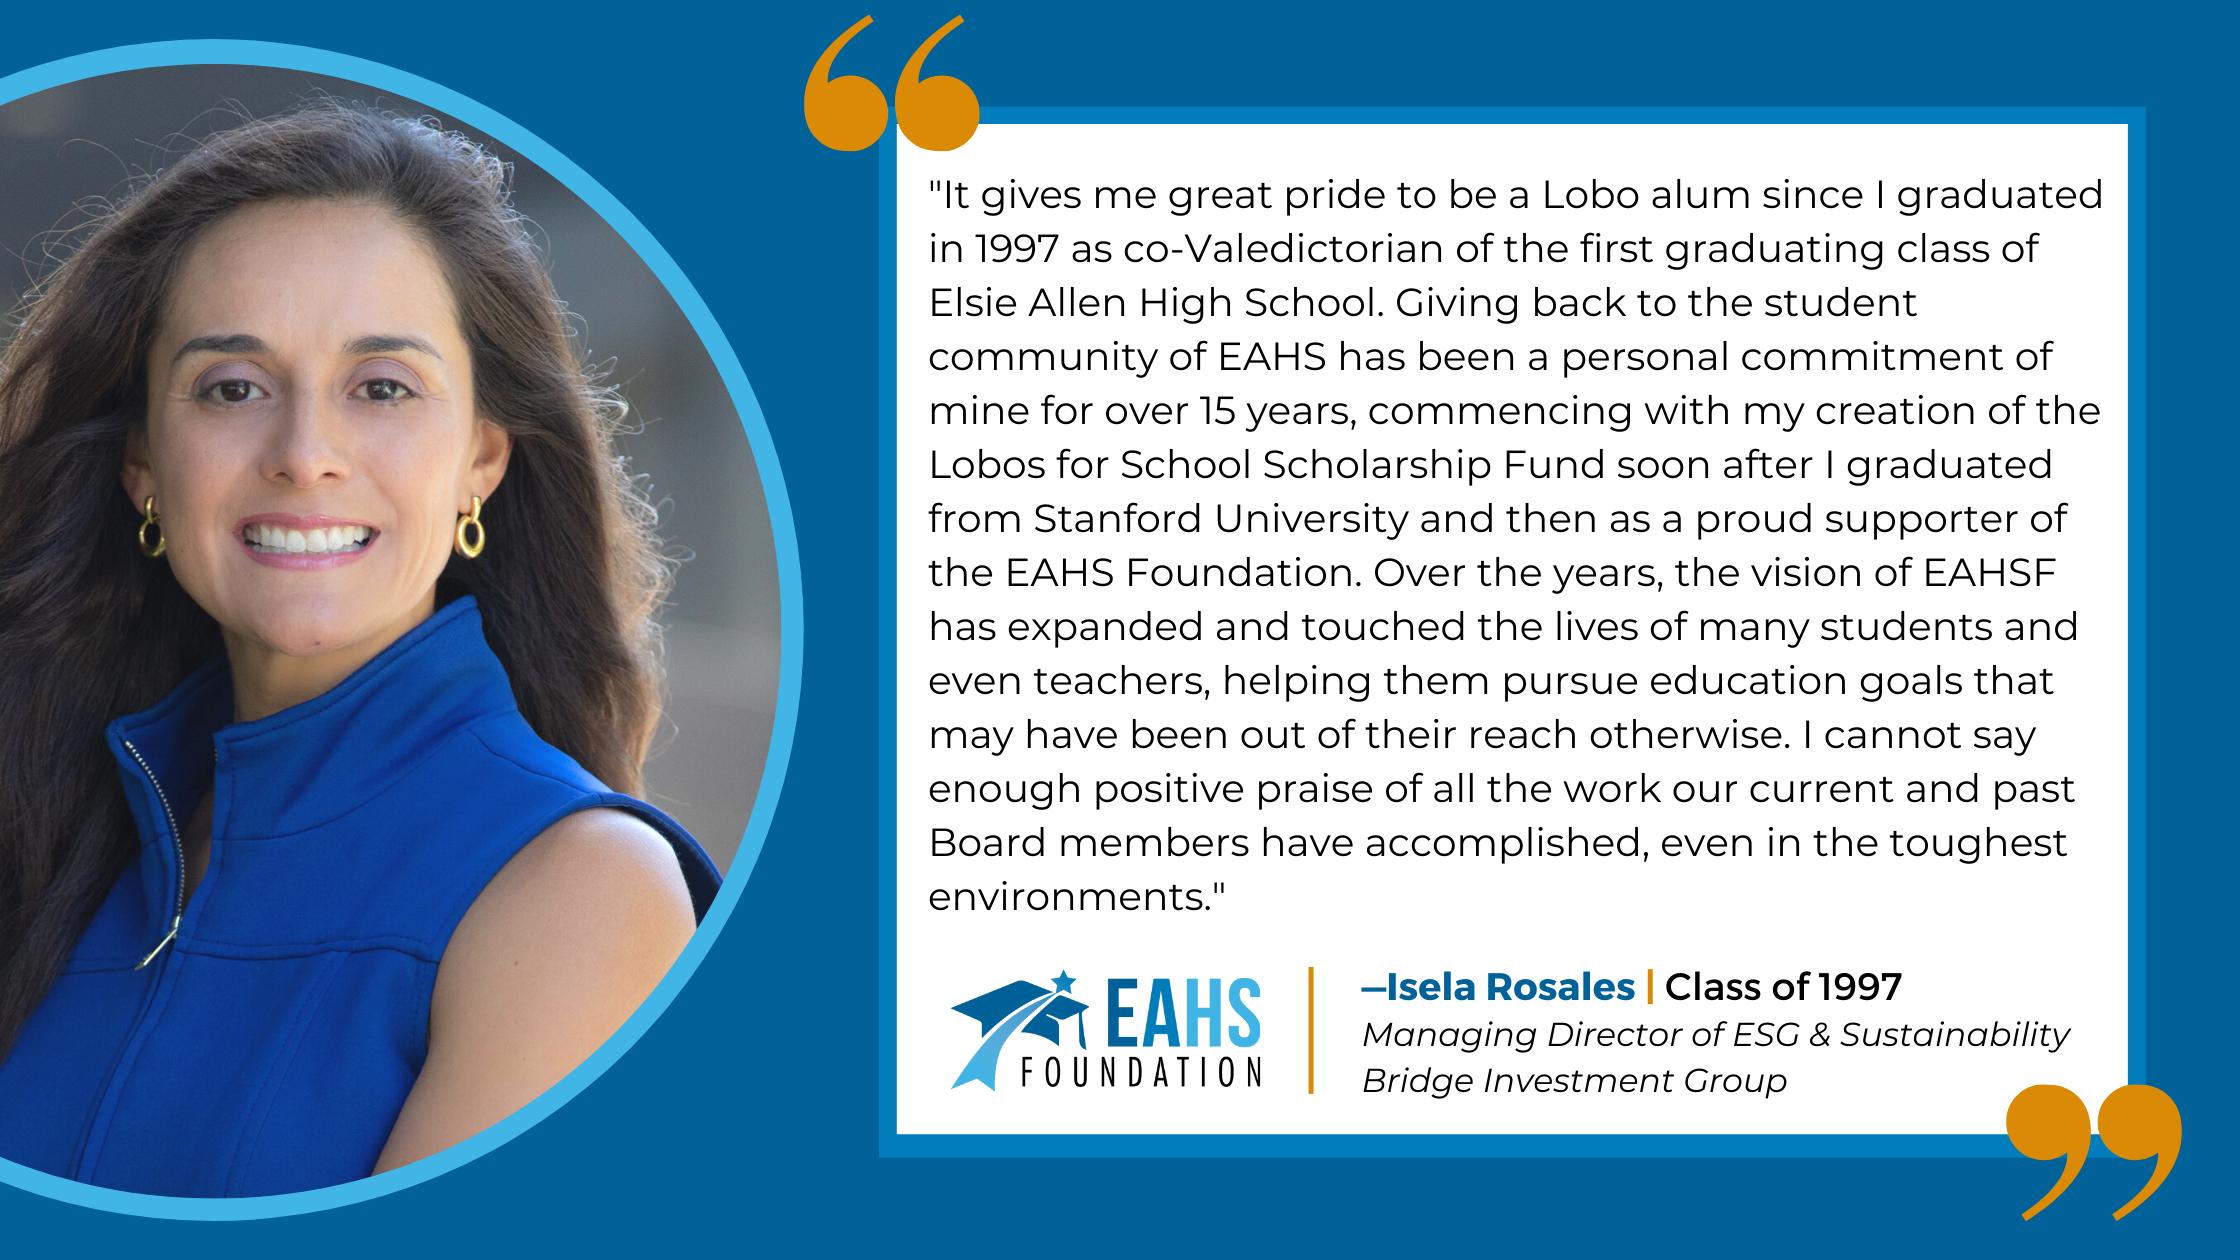 Alumni Spotlight - Isela Rosales, EAHS Foundation